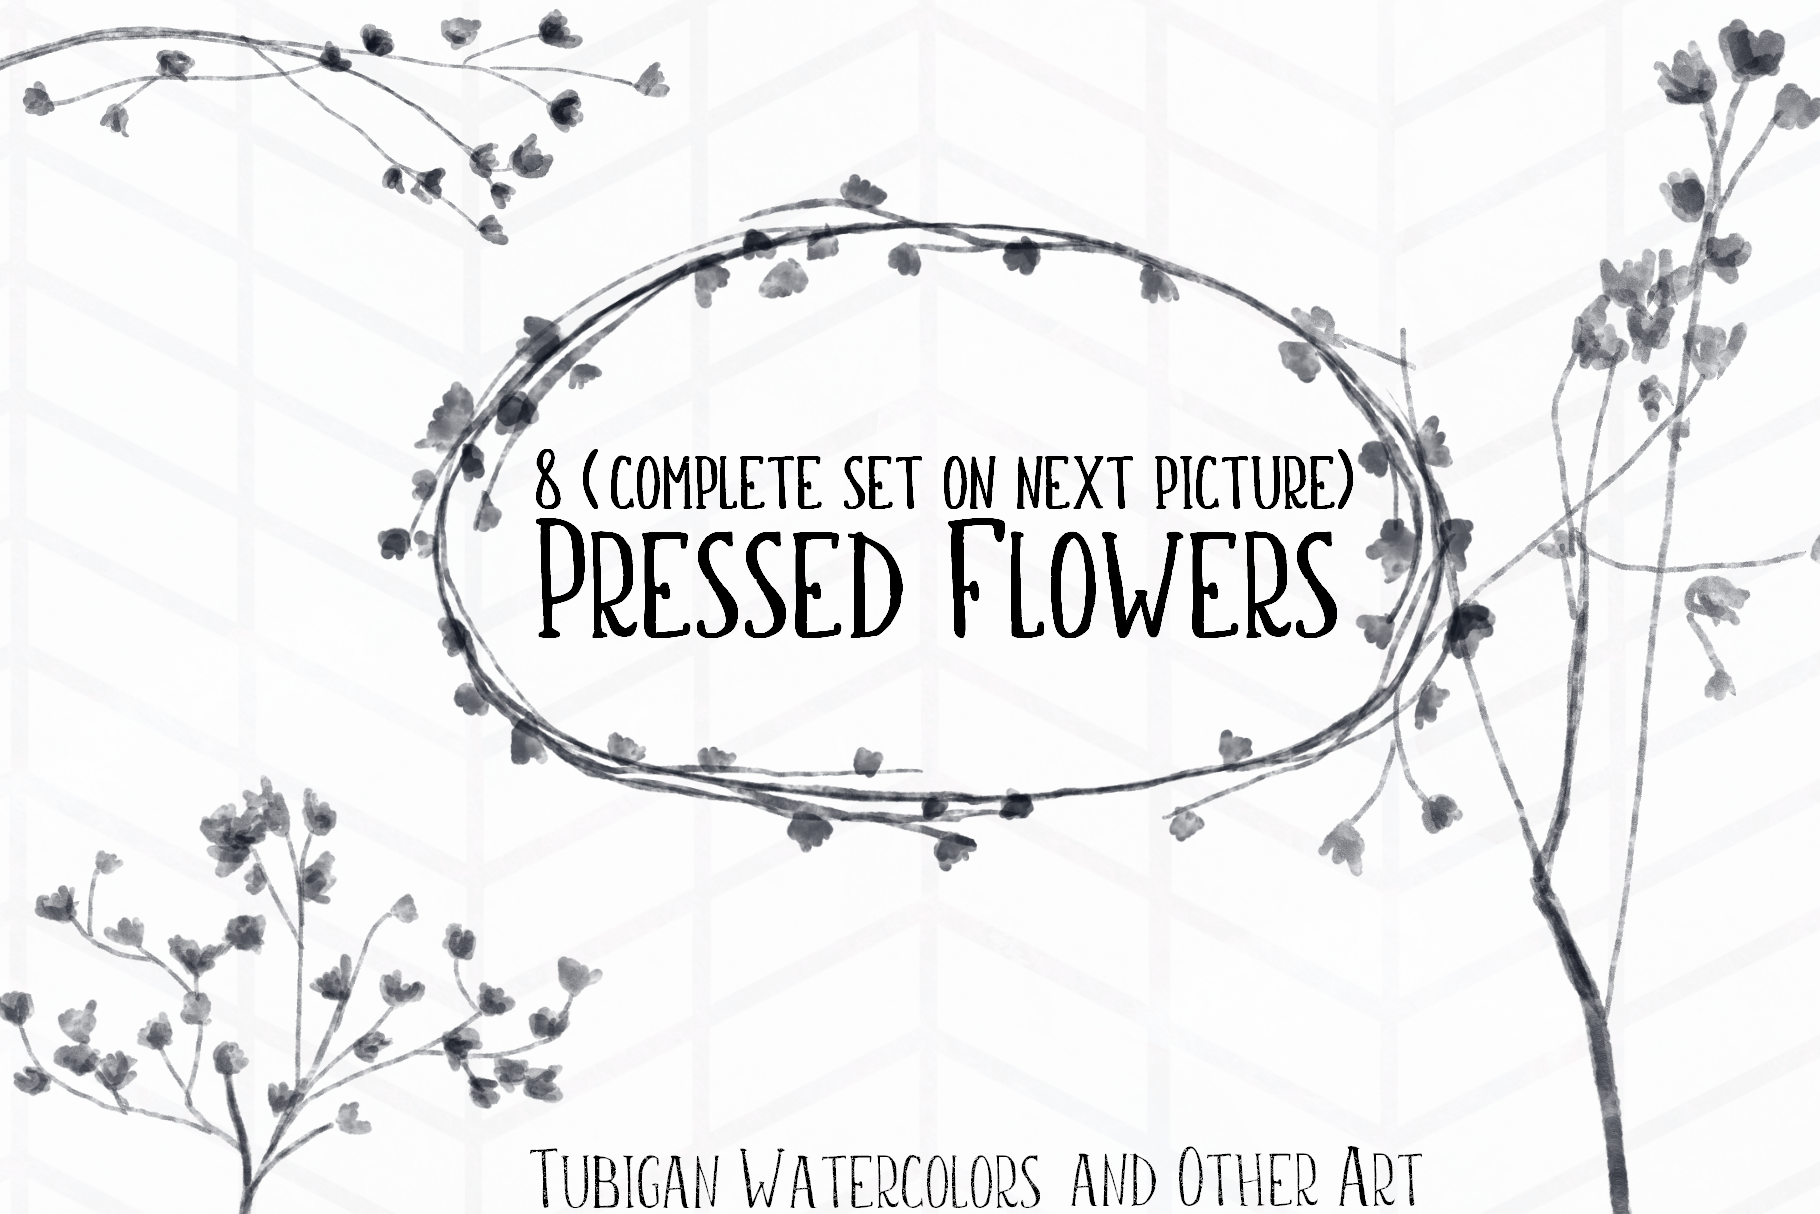 8 Pressed Flowers example image 1